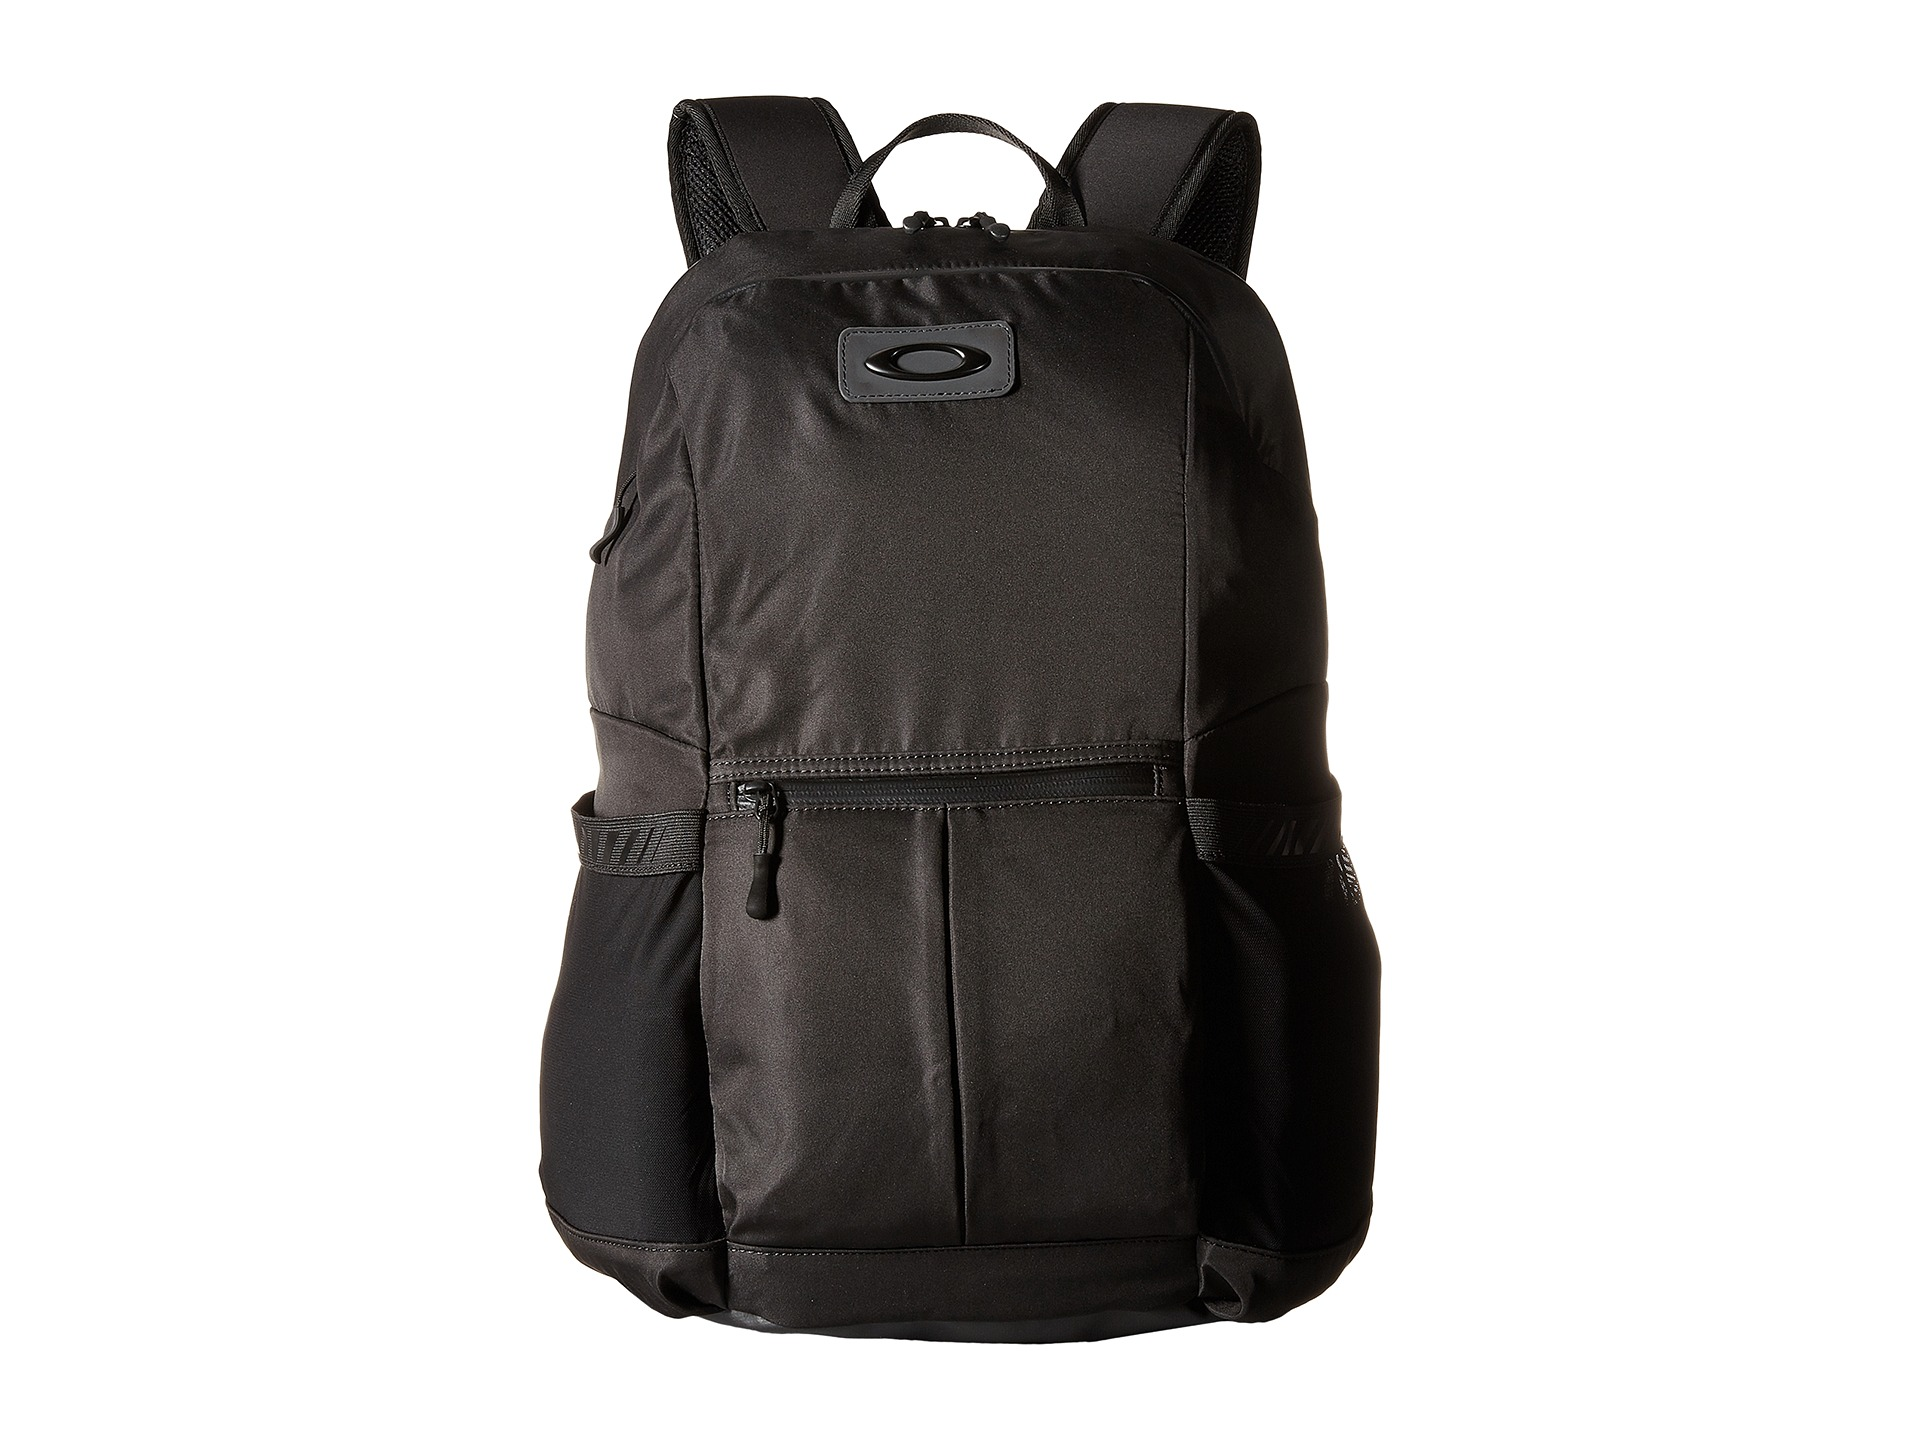 defc9a2a5e Zappos Oakley Backpack « Heritage Malta